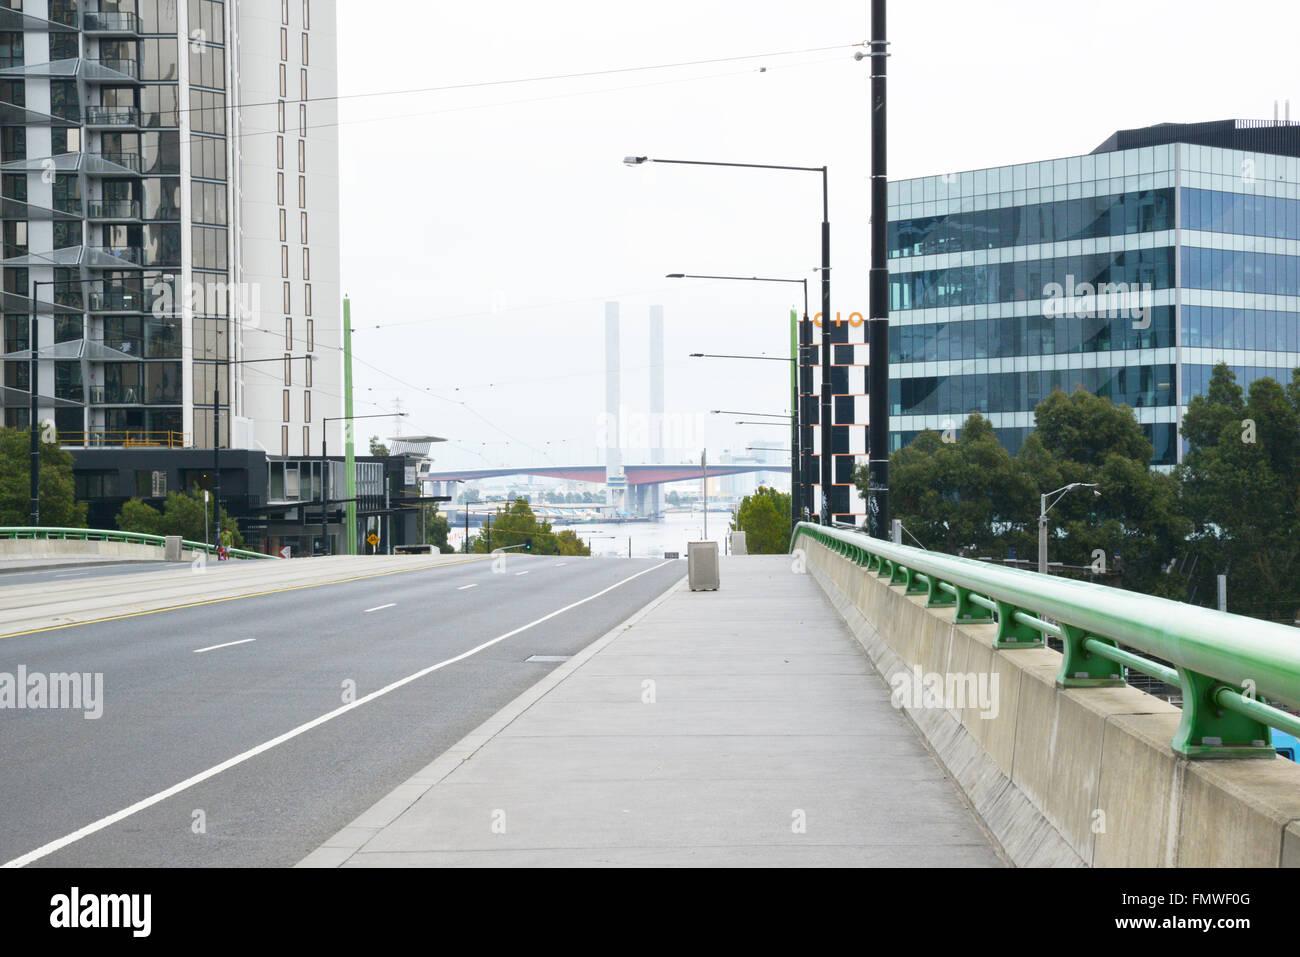 The Docklands, Melbourne, Victoria, Australia - Stock Image